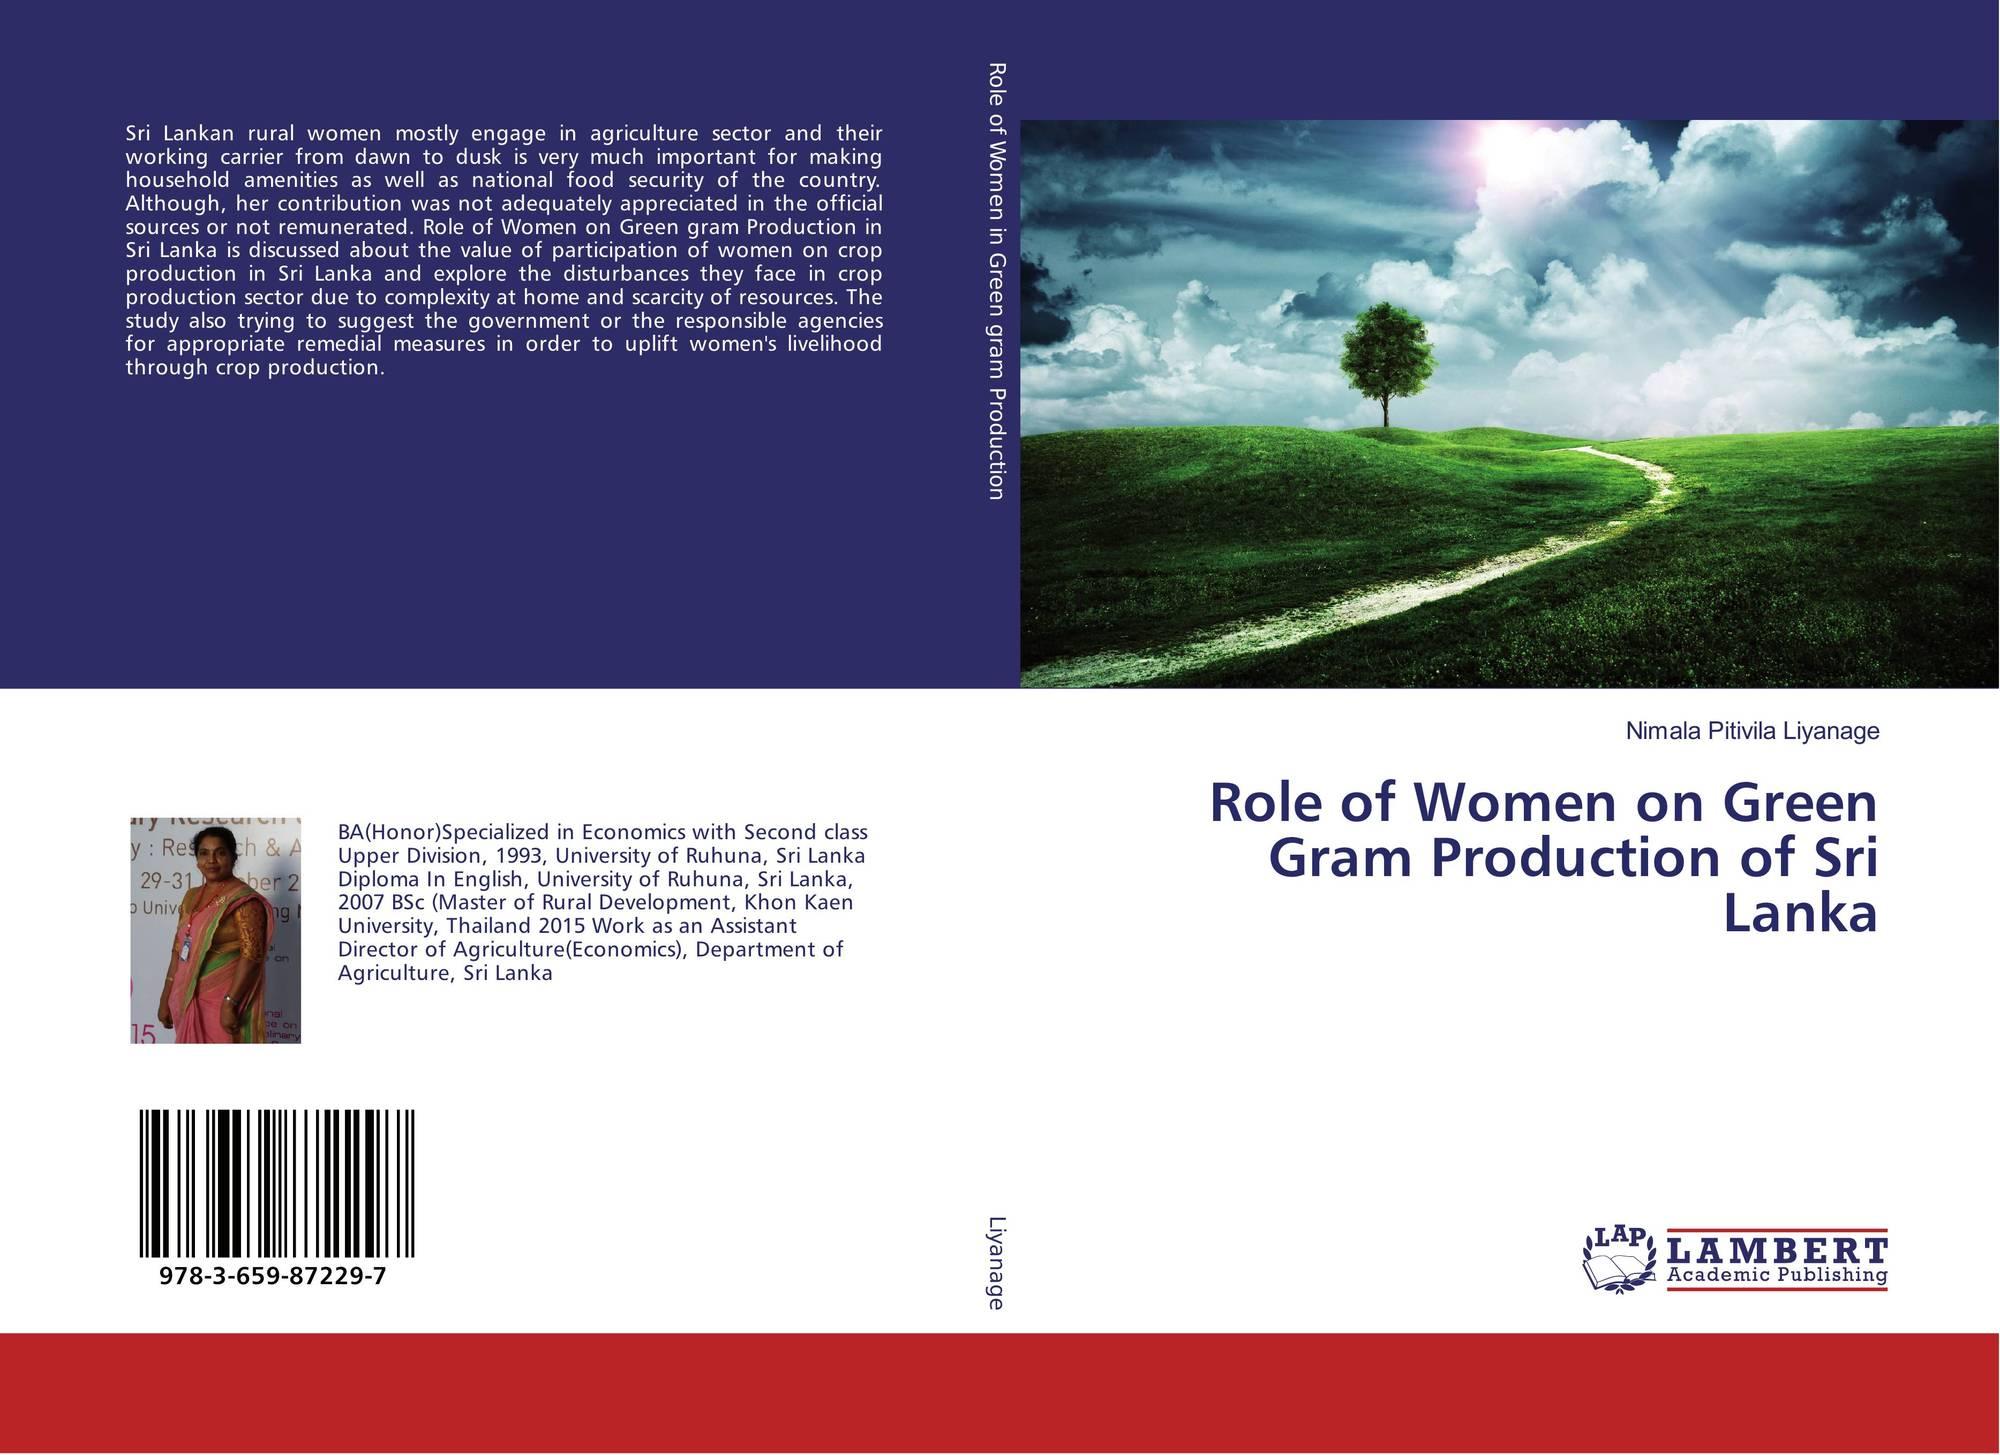 Role of Women on Green Gram Production of Sri Lanka, 978-3